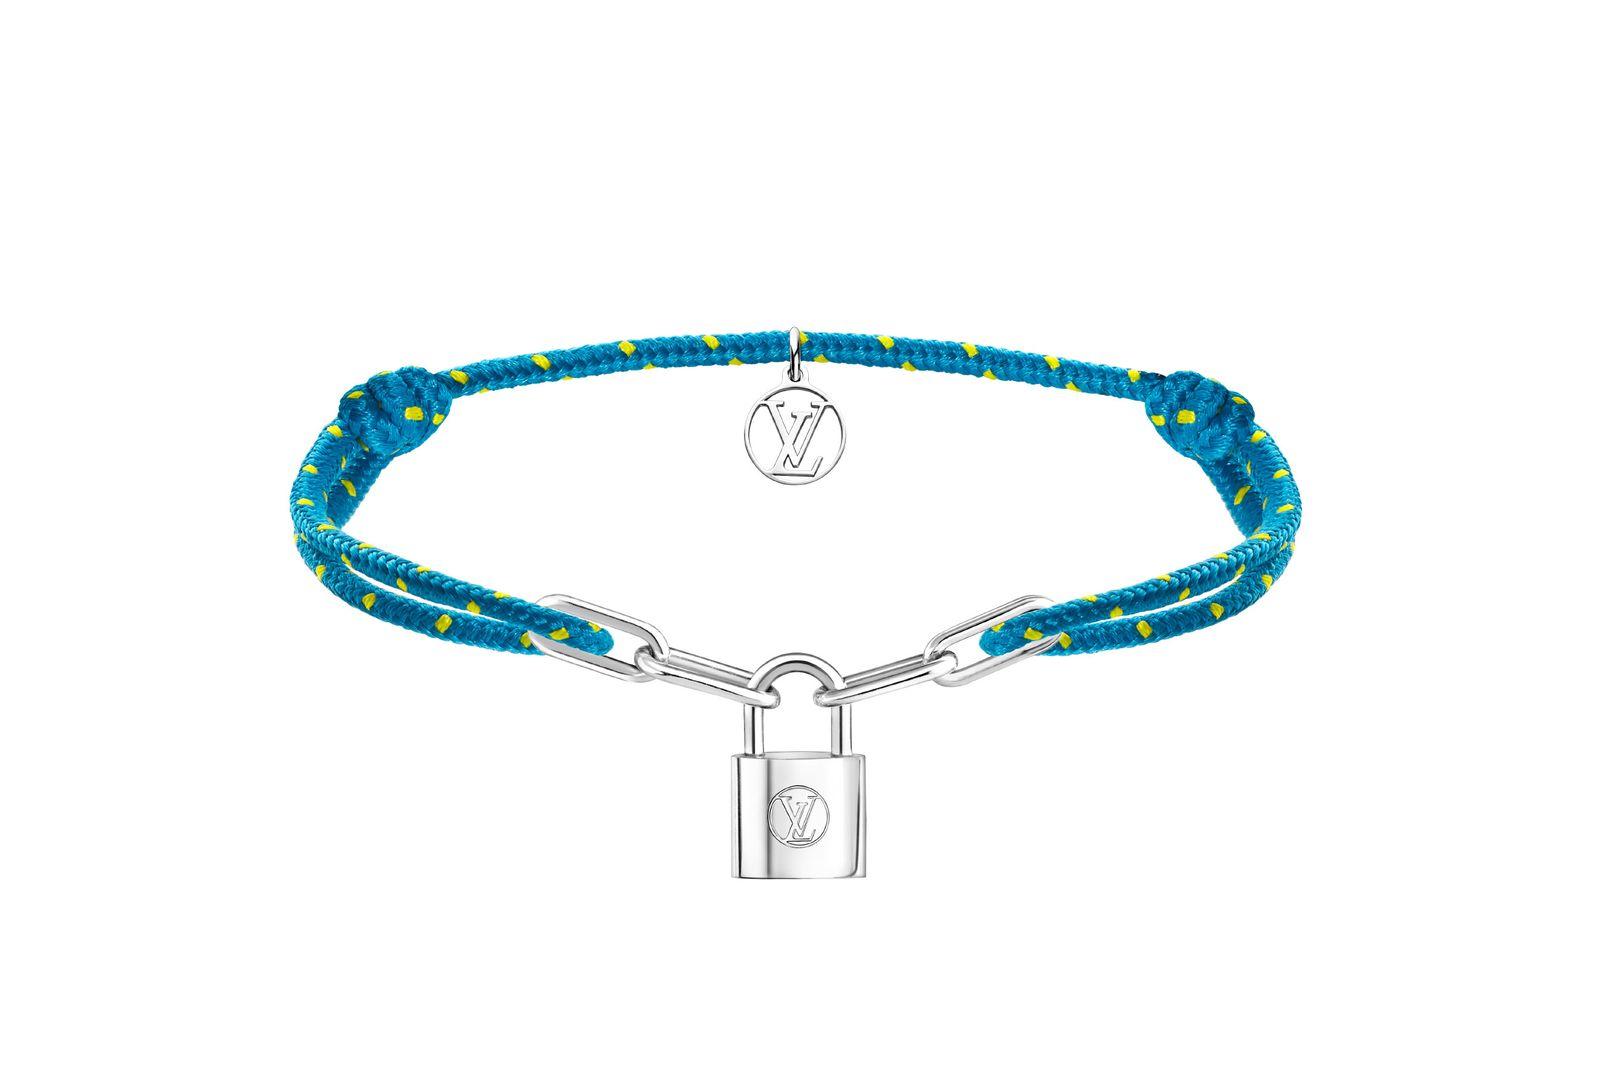 LV_EDITED_Q95866_Bracelet-Silver-Lockit-x-V.A._Bleu-et-Jaune